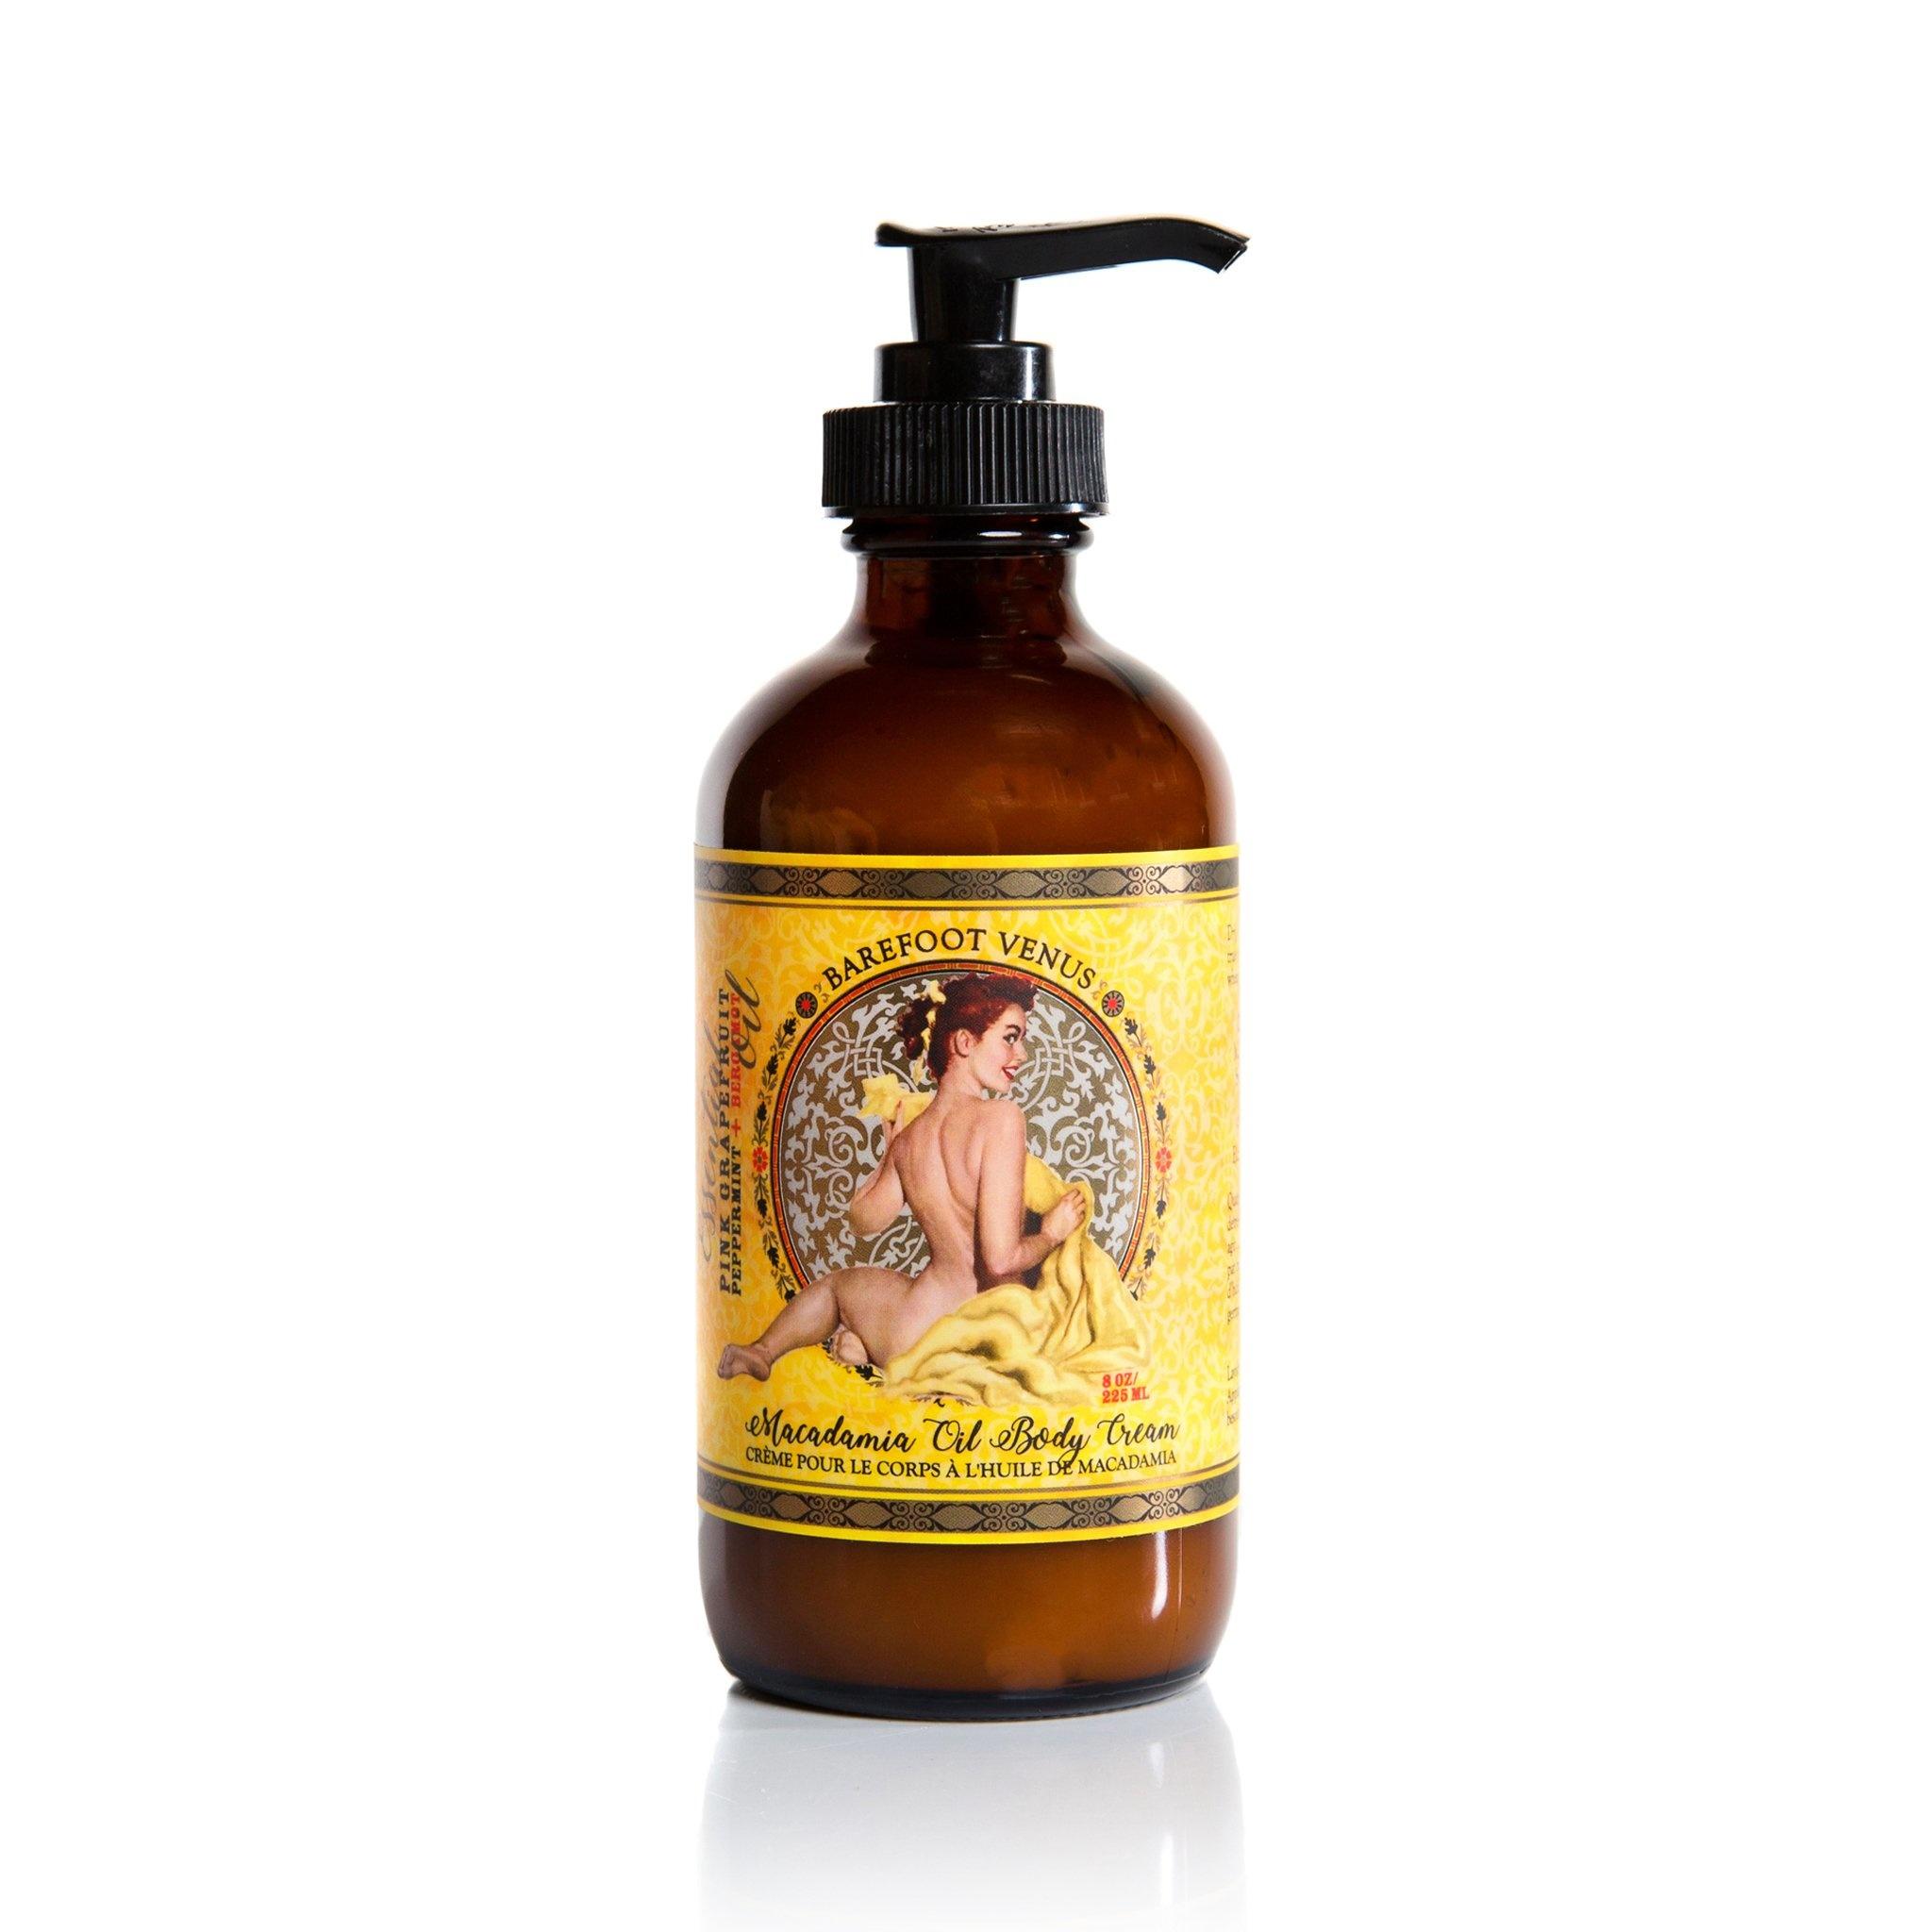 Barefoot Venus Mustard Bath Body cream